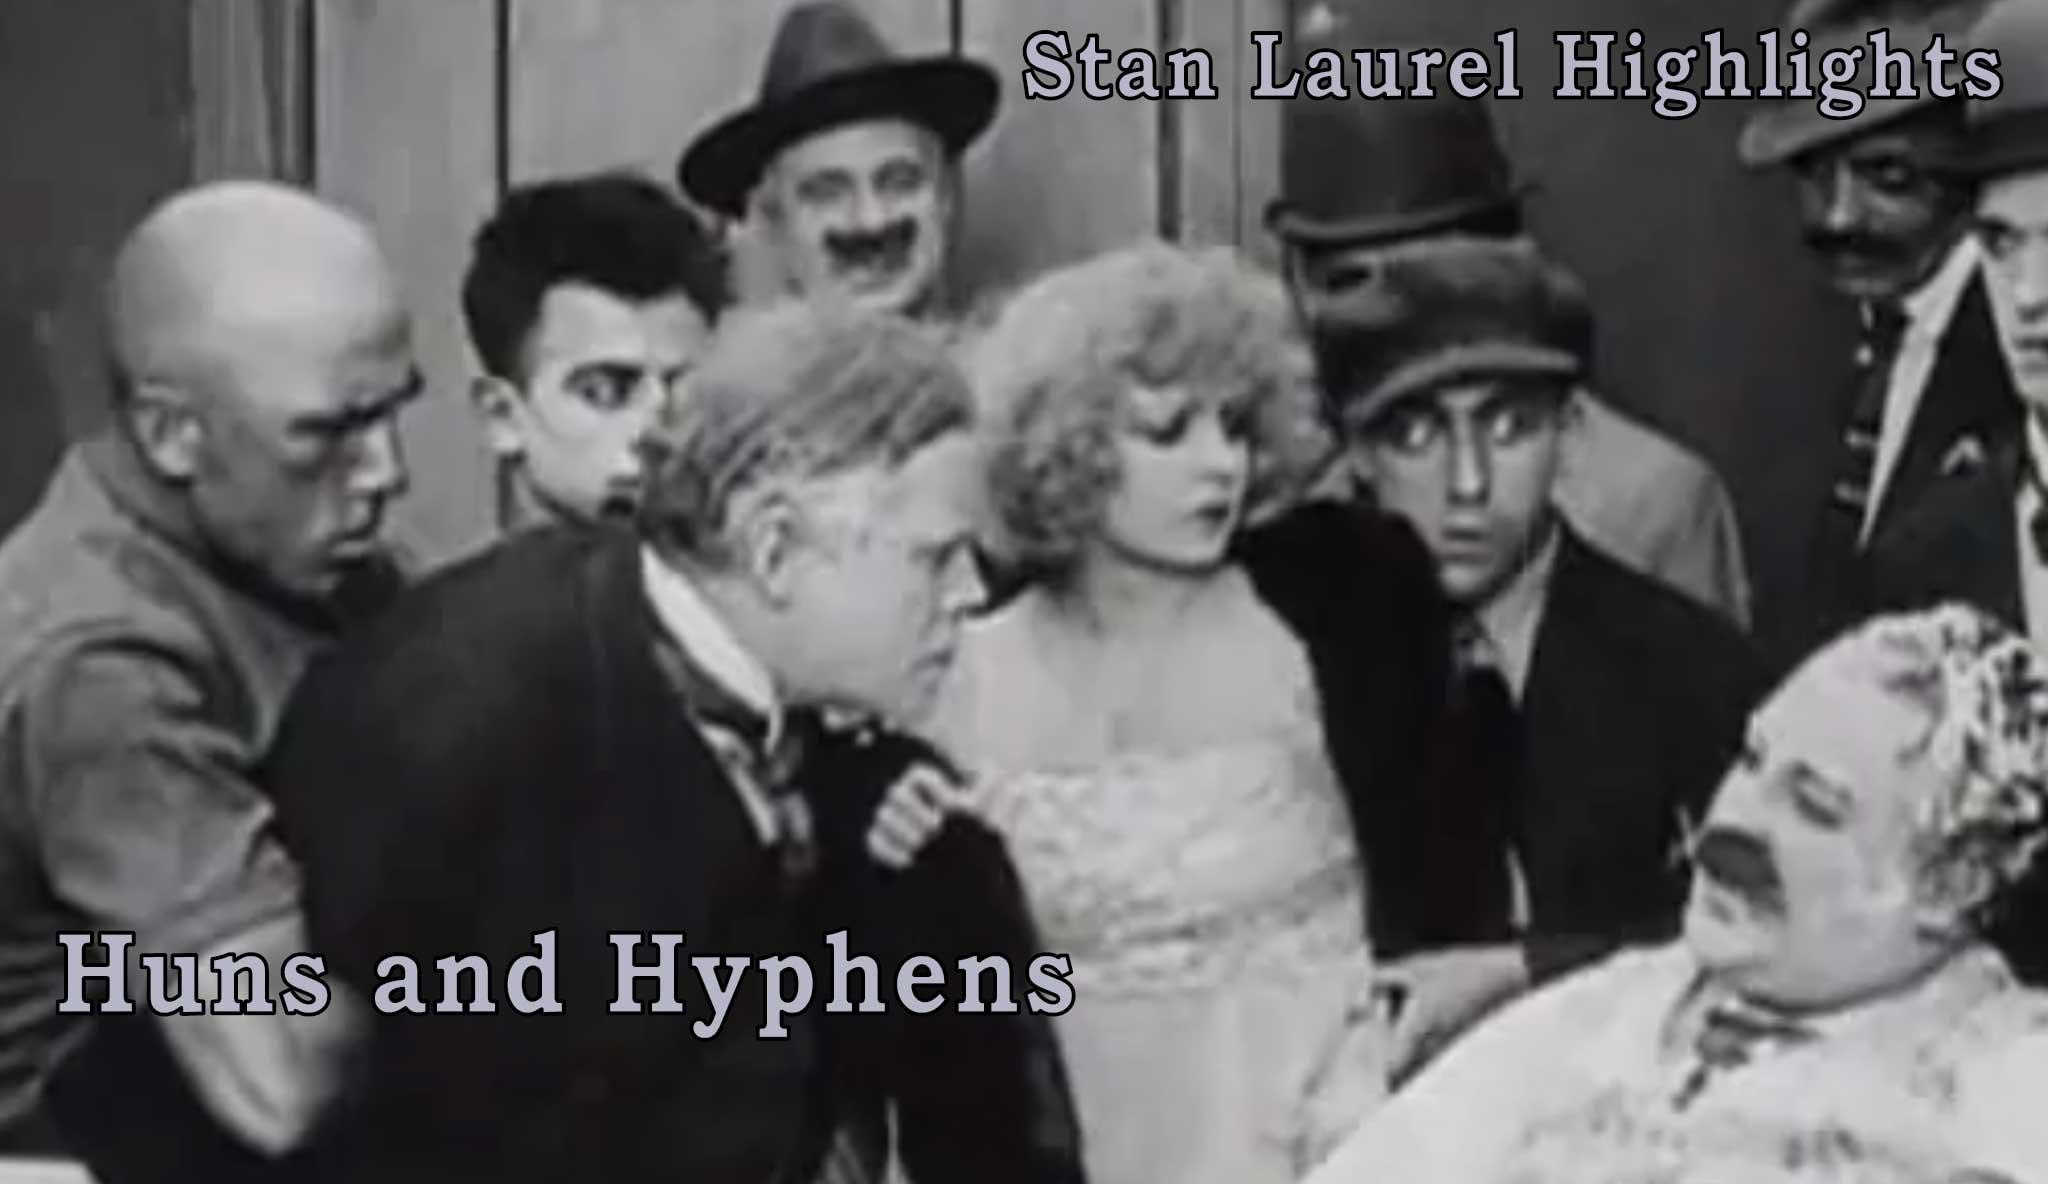 stan-laurel-highlights-huns-and-hyphens\header.jpg